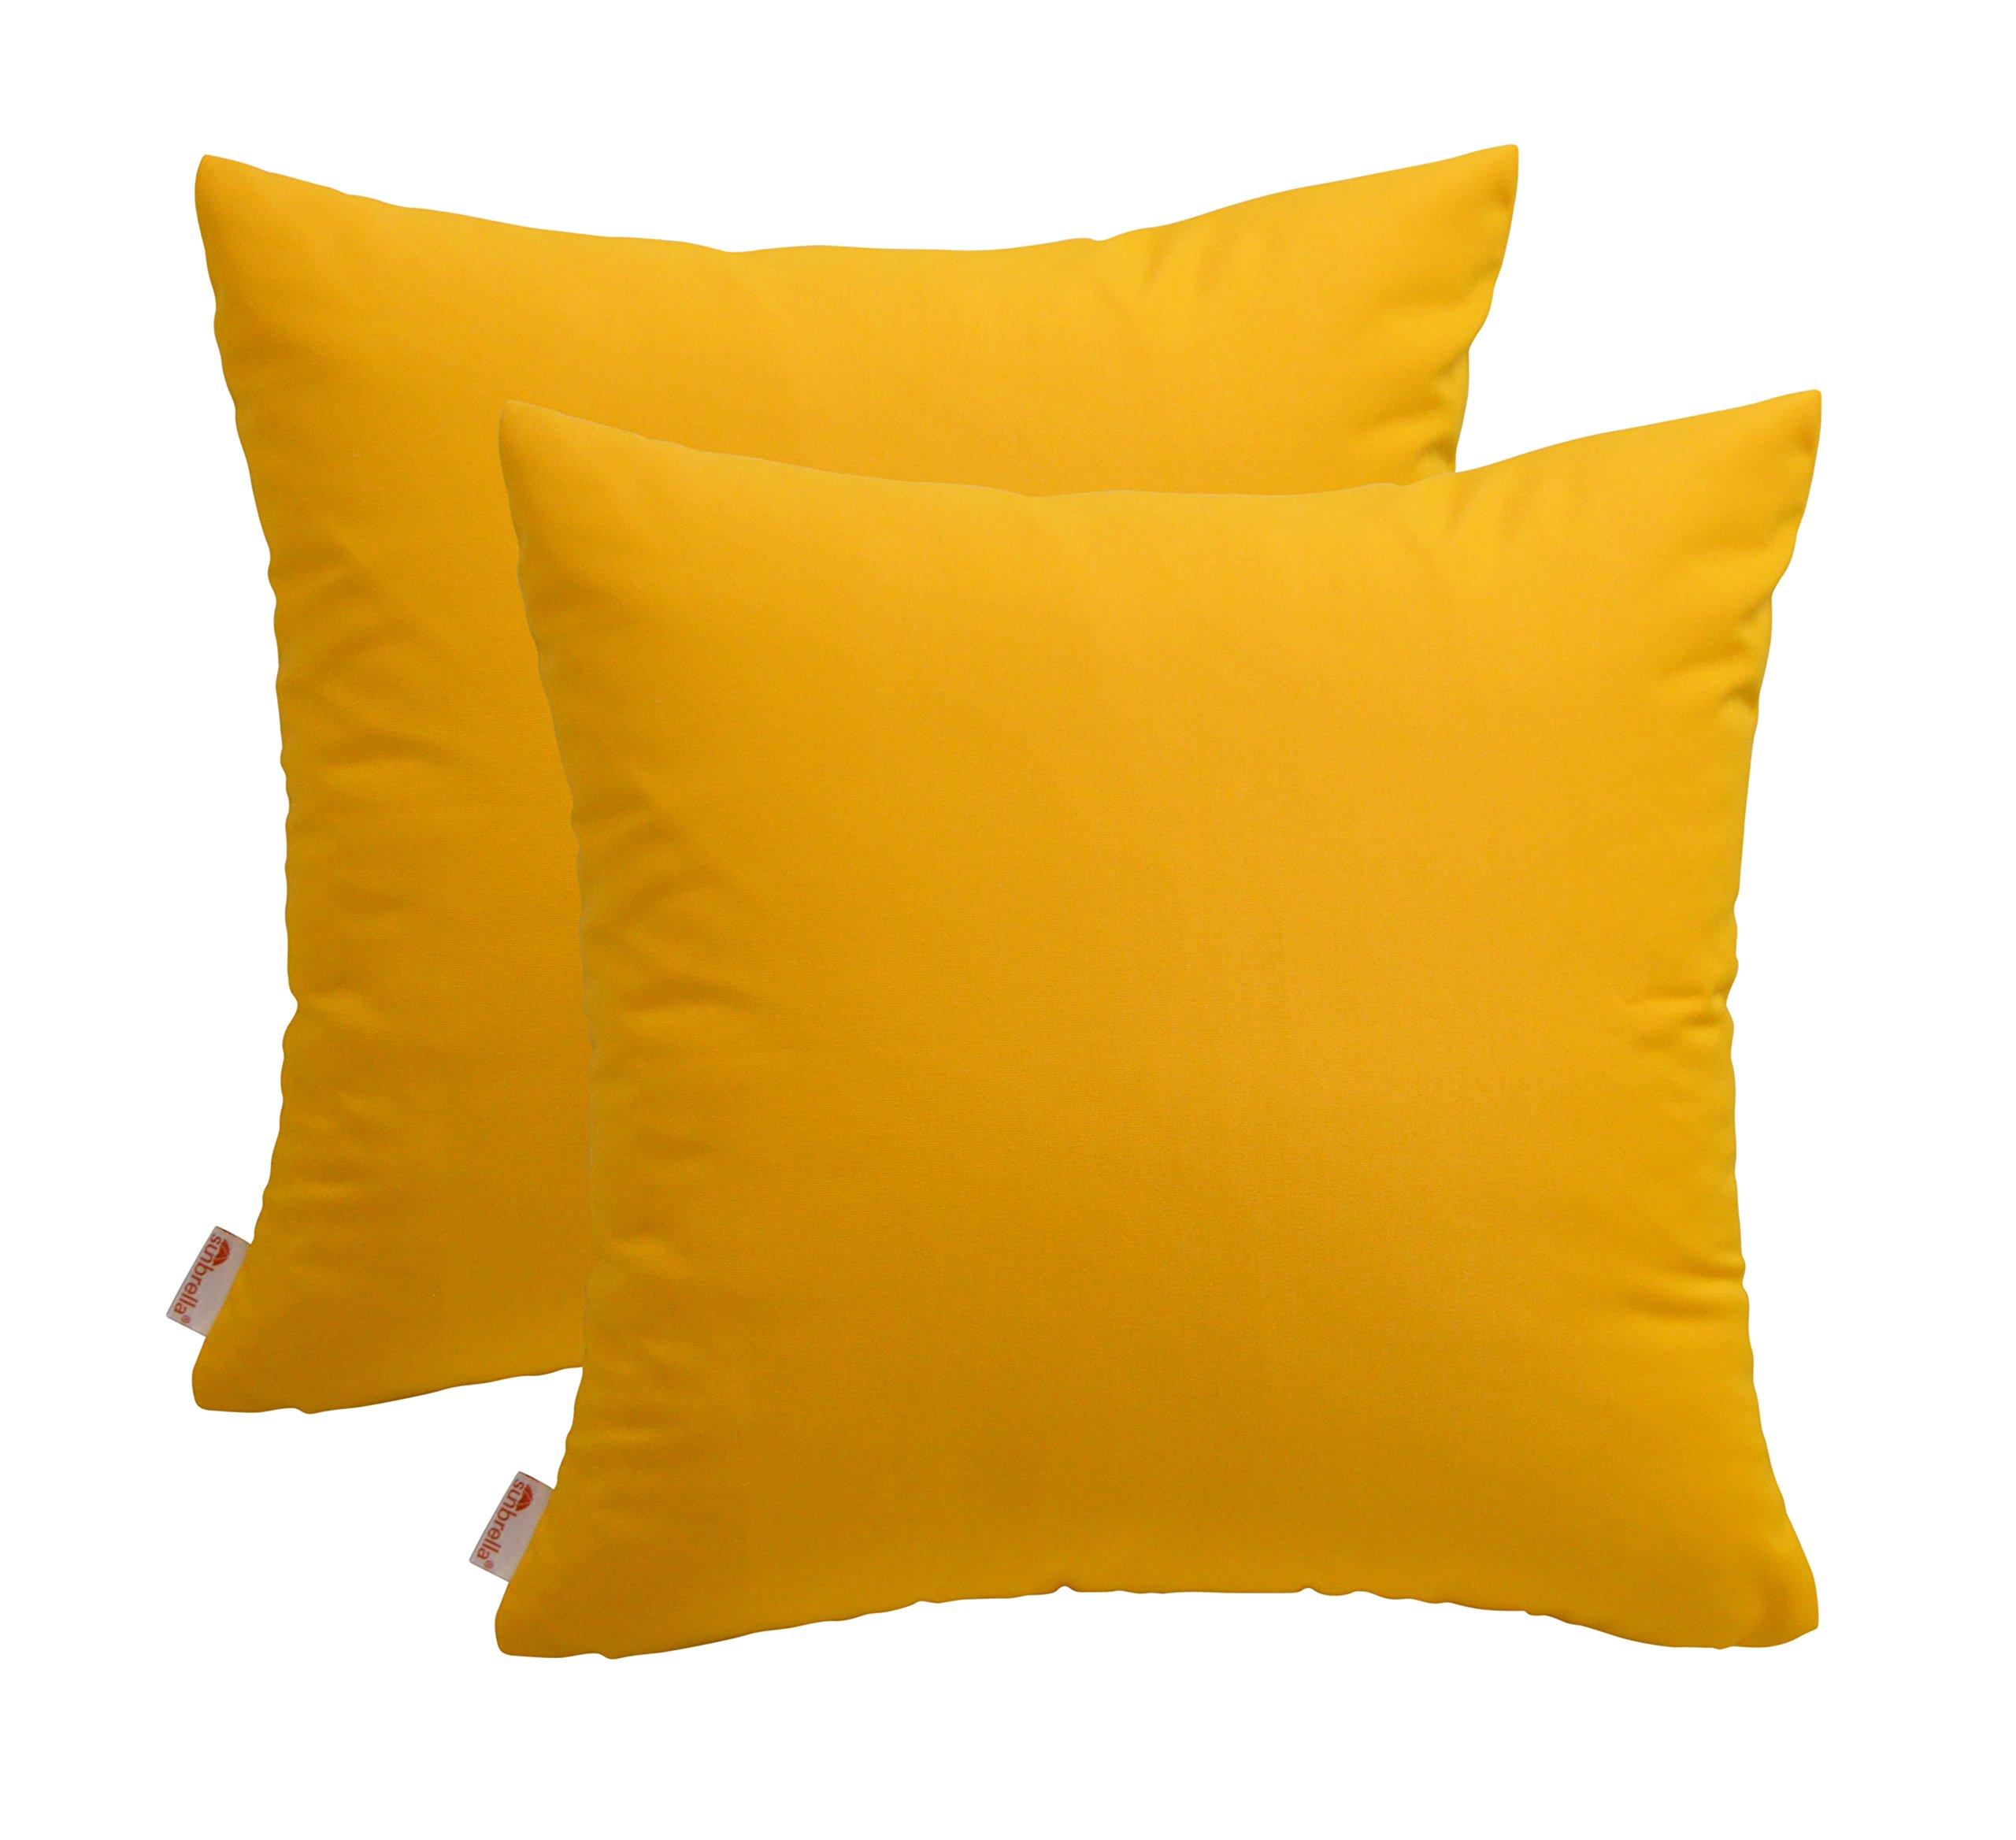 RSH Décor Set of 2 Indoor/Outdoor Decorative Throw Pillows Sunbrella Sunflower Yellow - 22'' x 22''